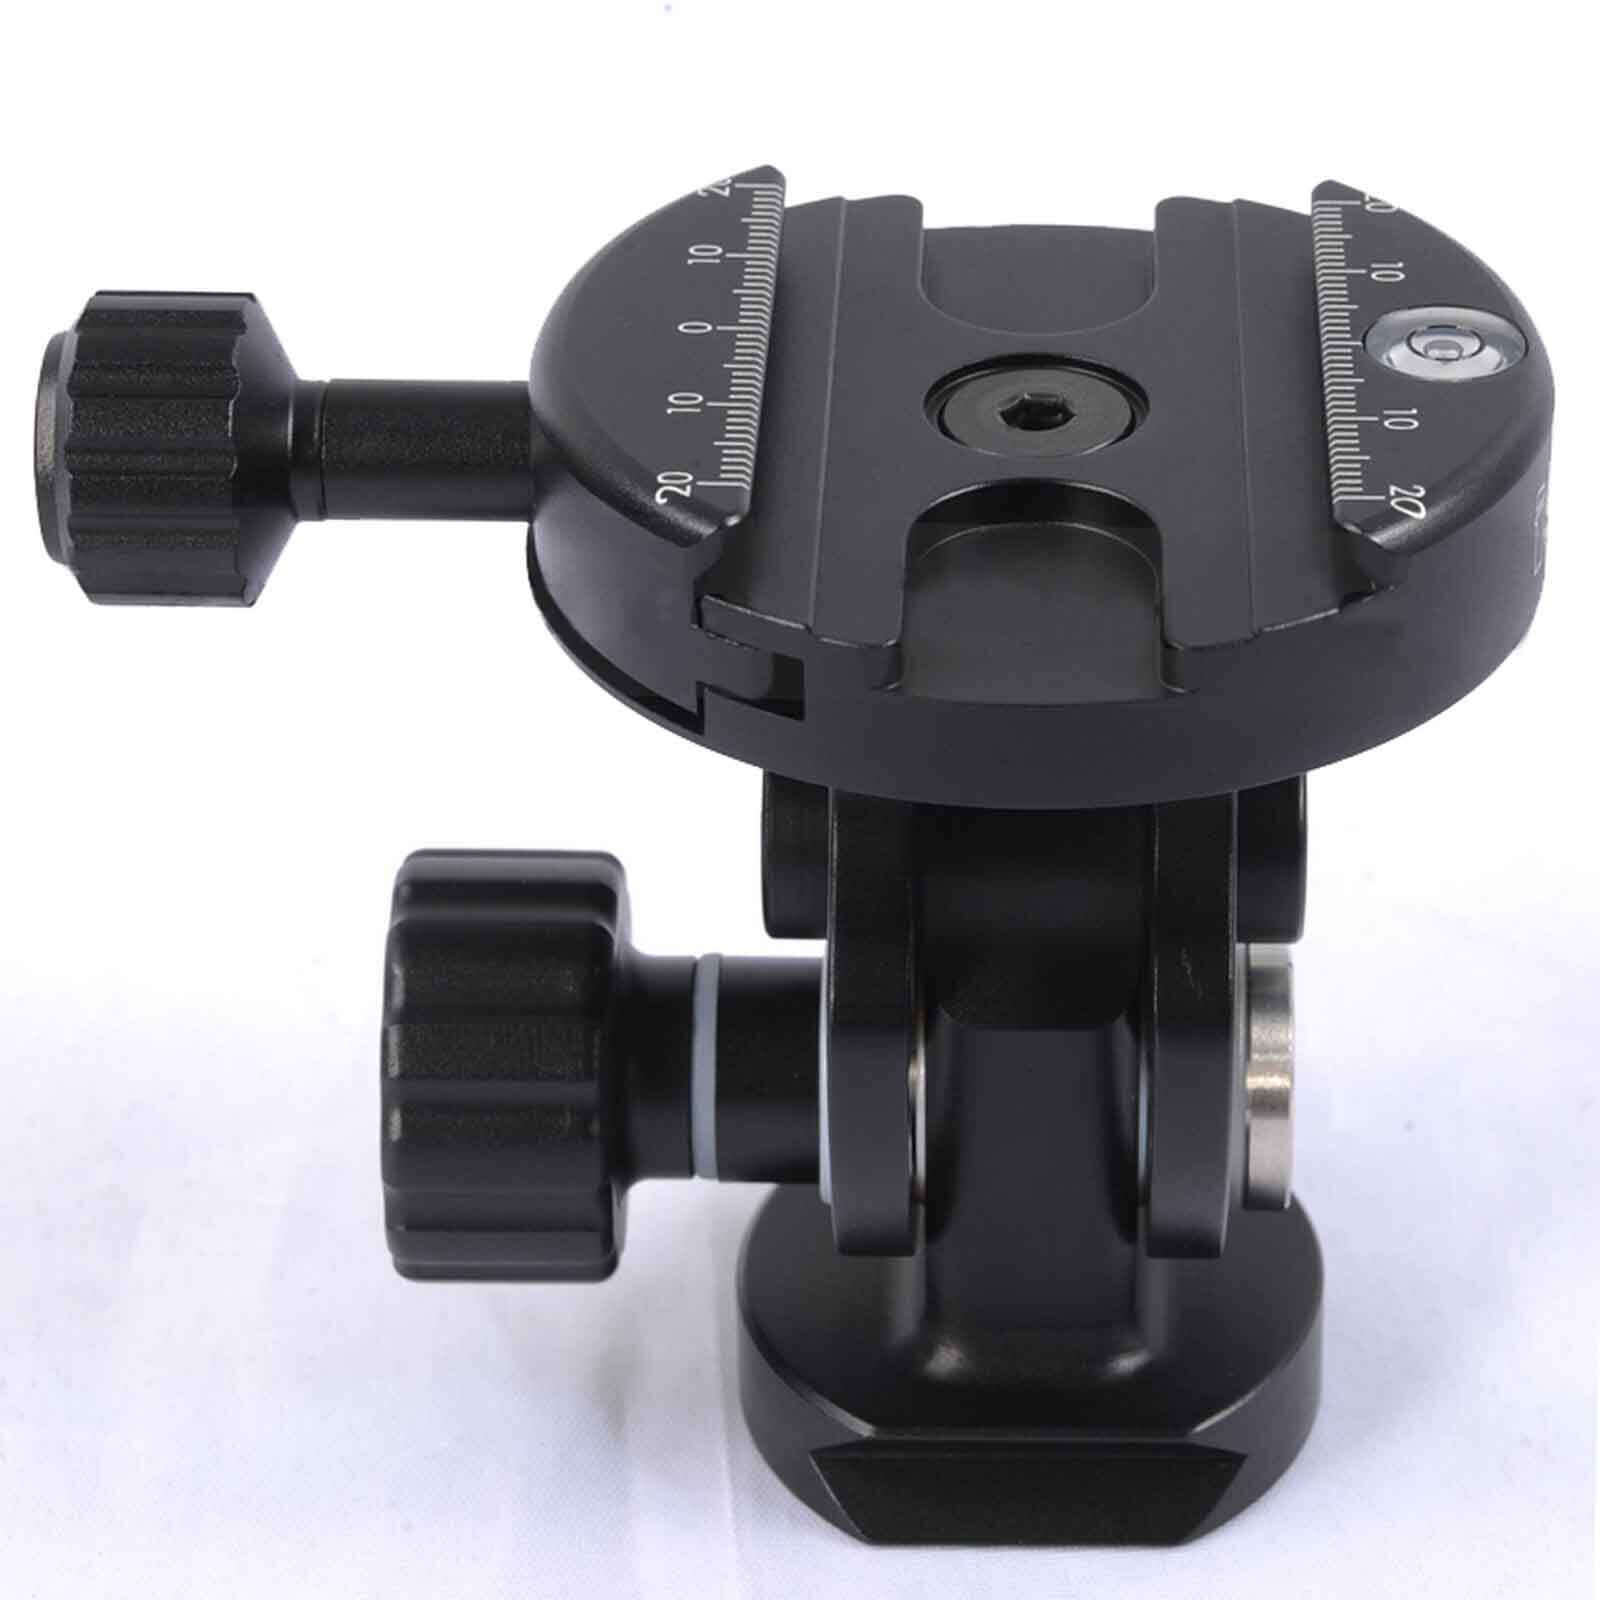 2D Ball Head + Clamp for Camera Tripod Monopod & Quick Release Plate